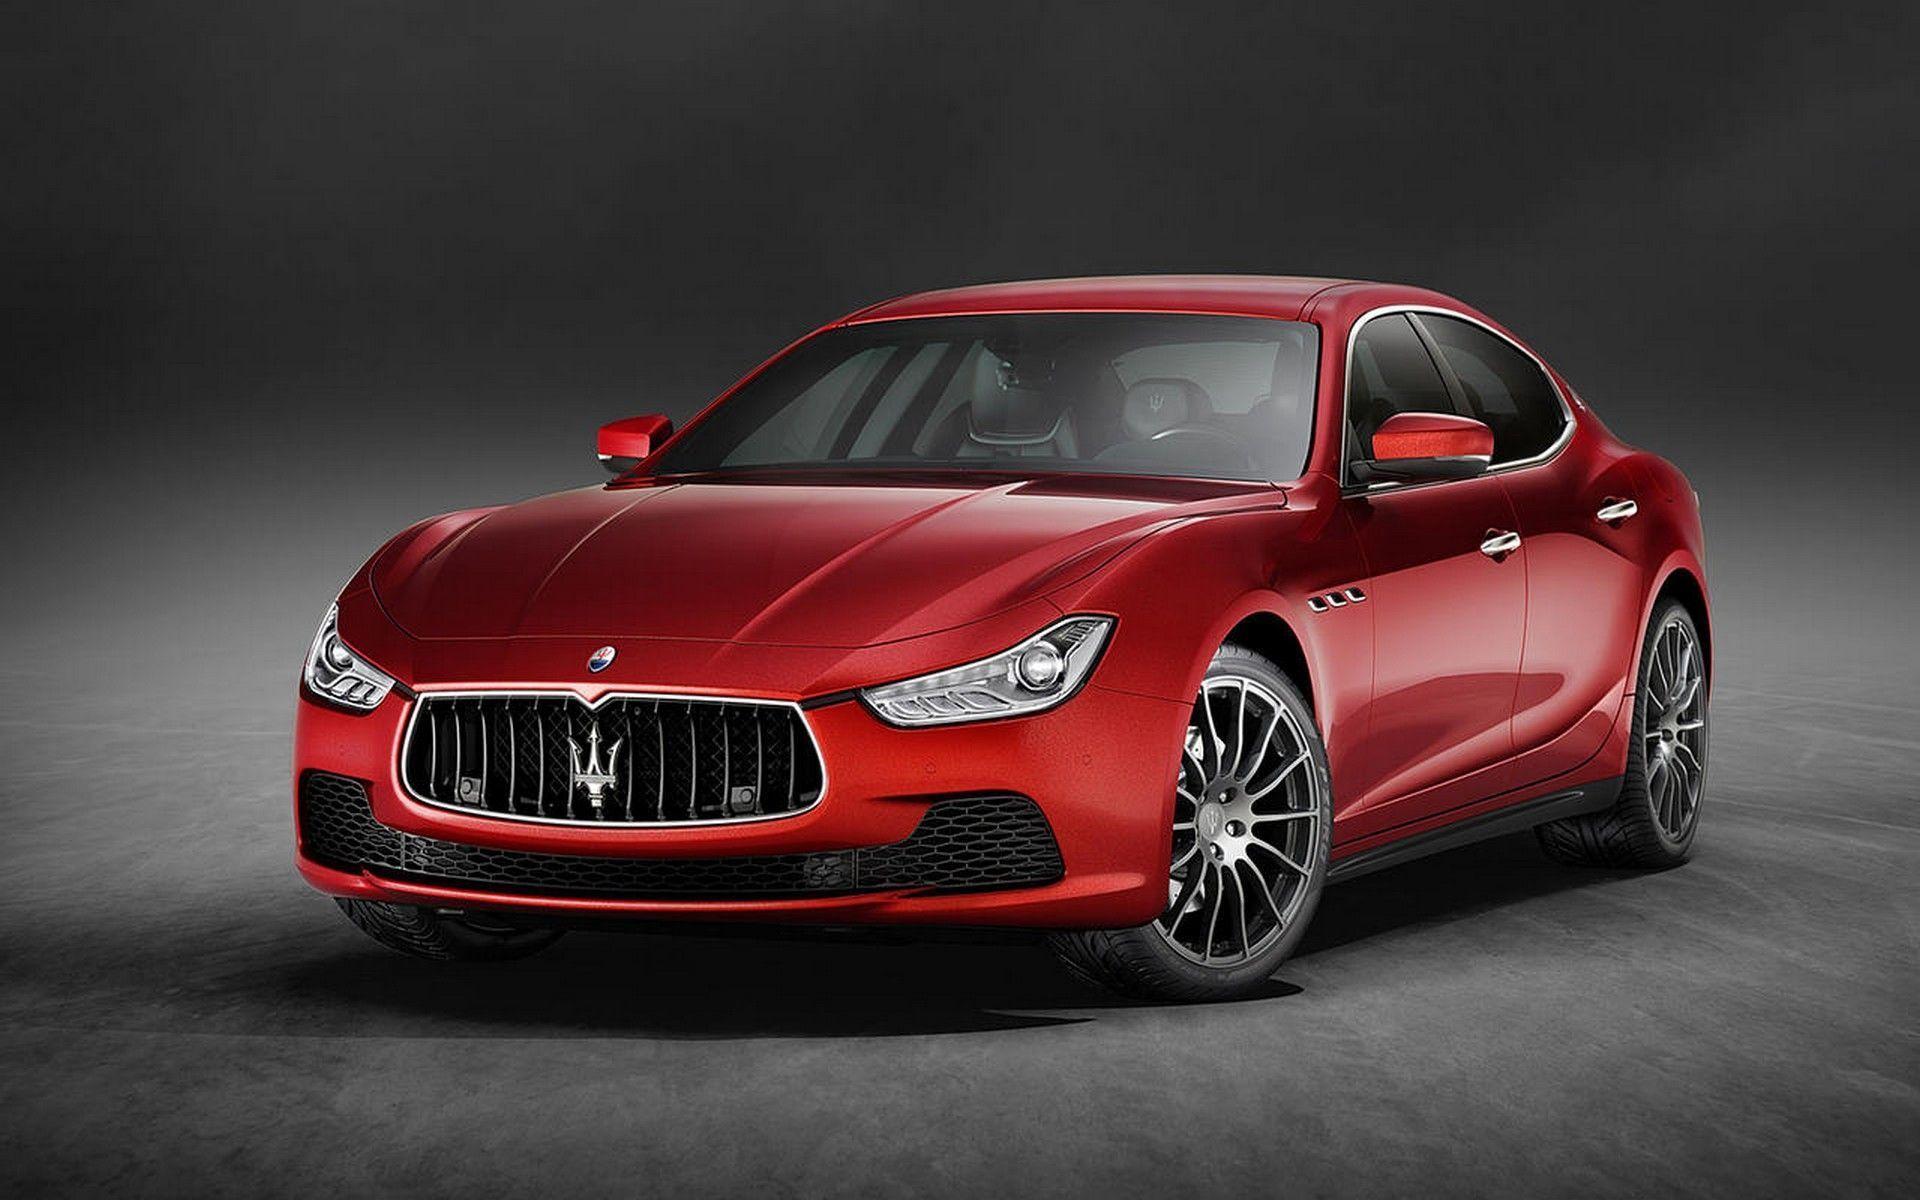 New 2019 Maserati Ghibli Rumors